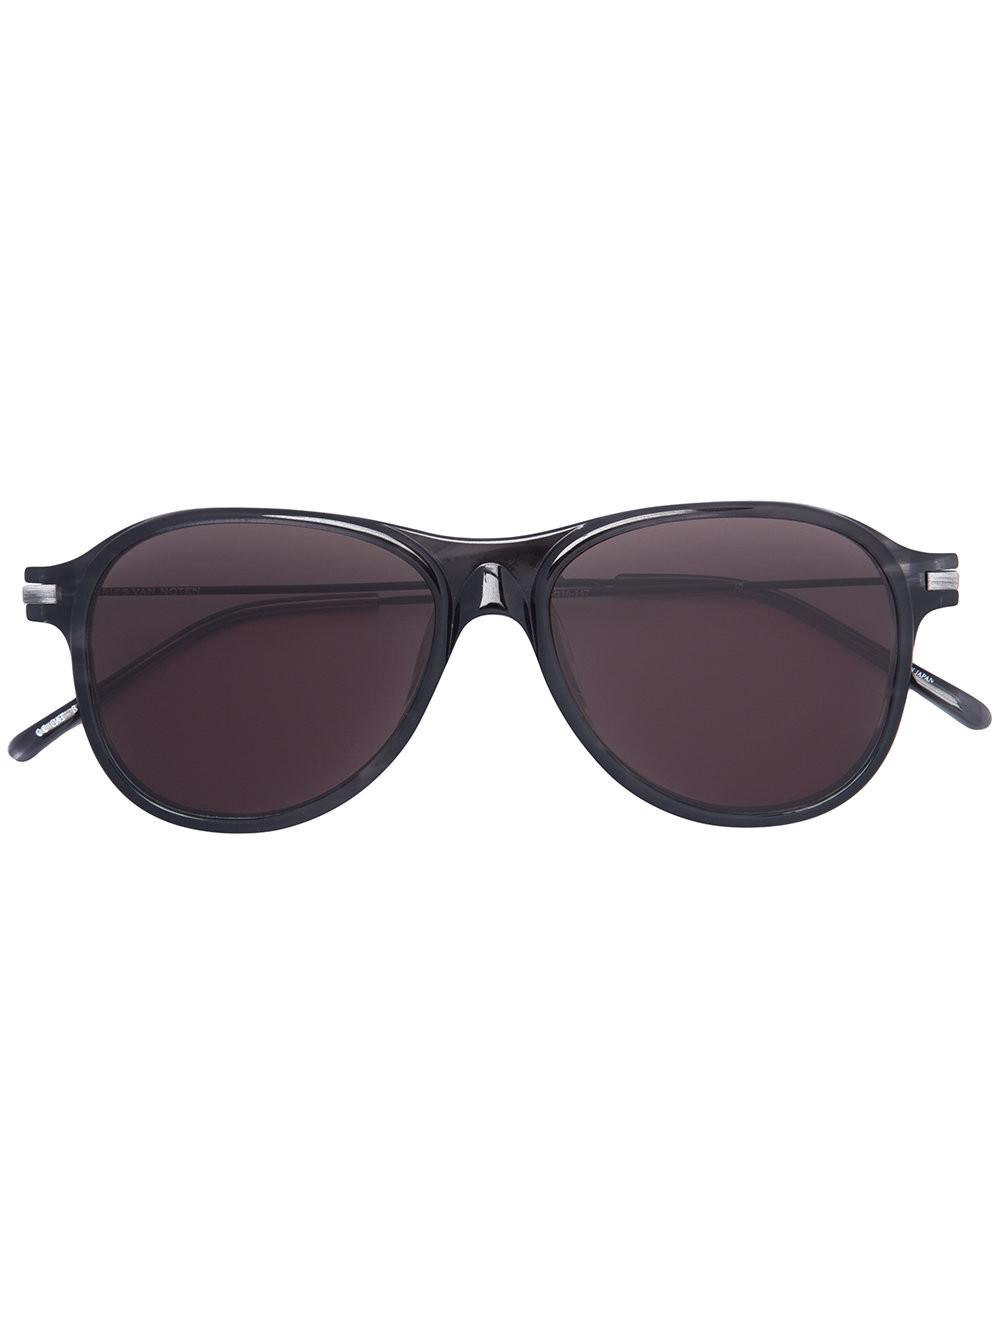 Dries Van Noten X Linda Farrow Aviator Sunglasses, Black